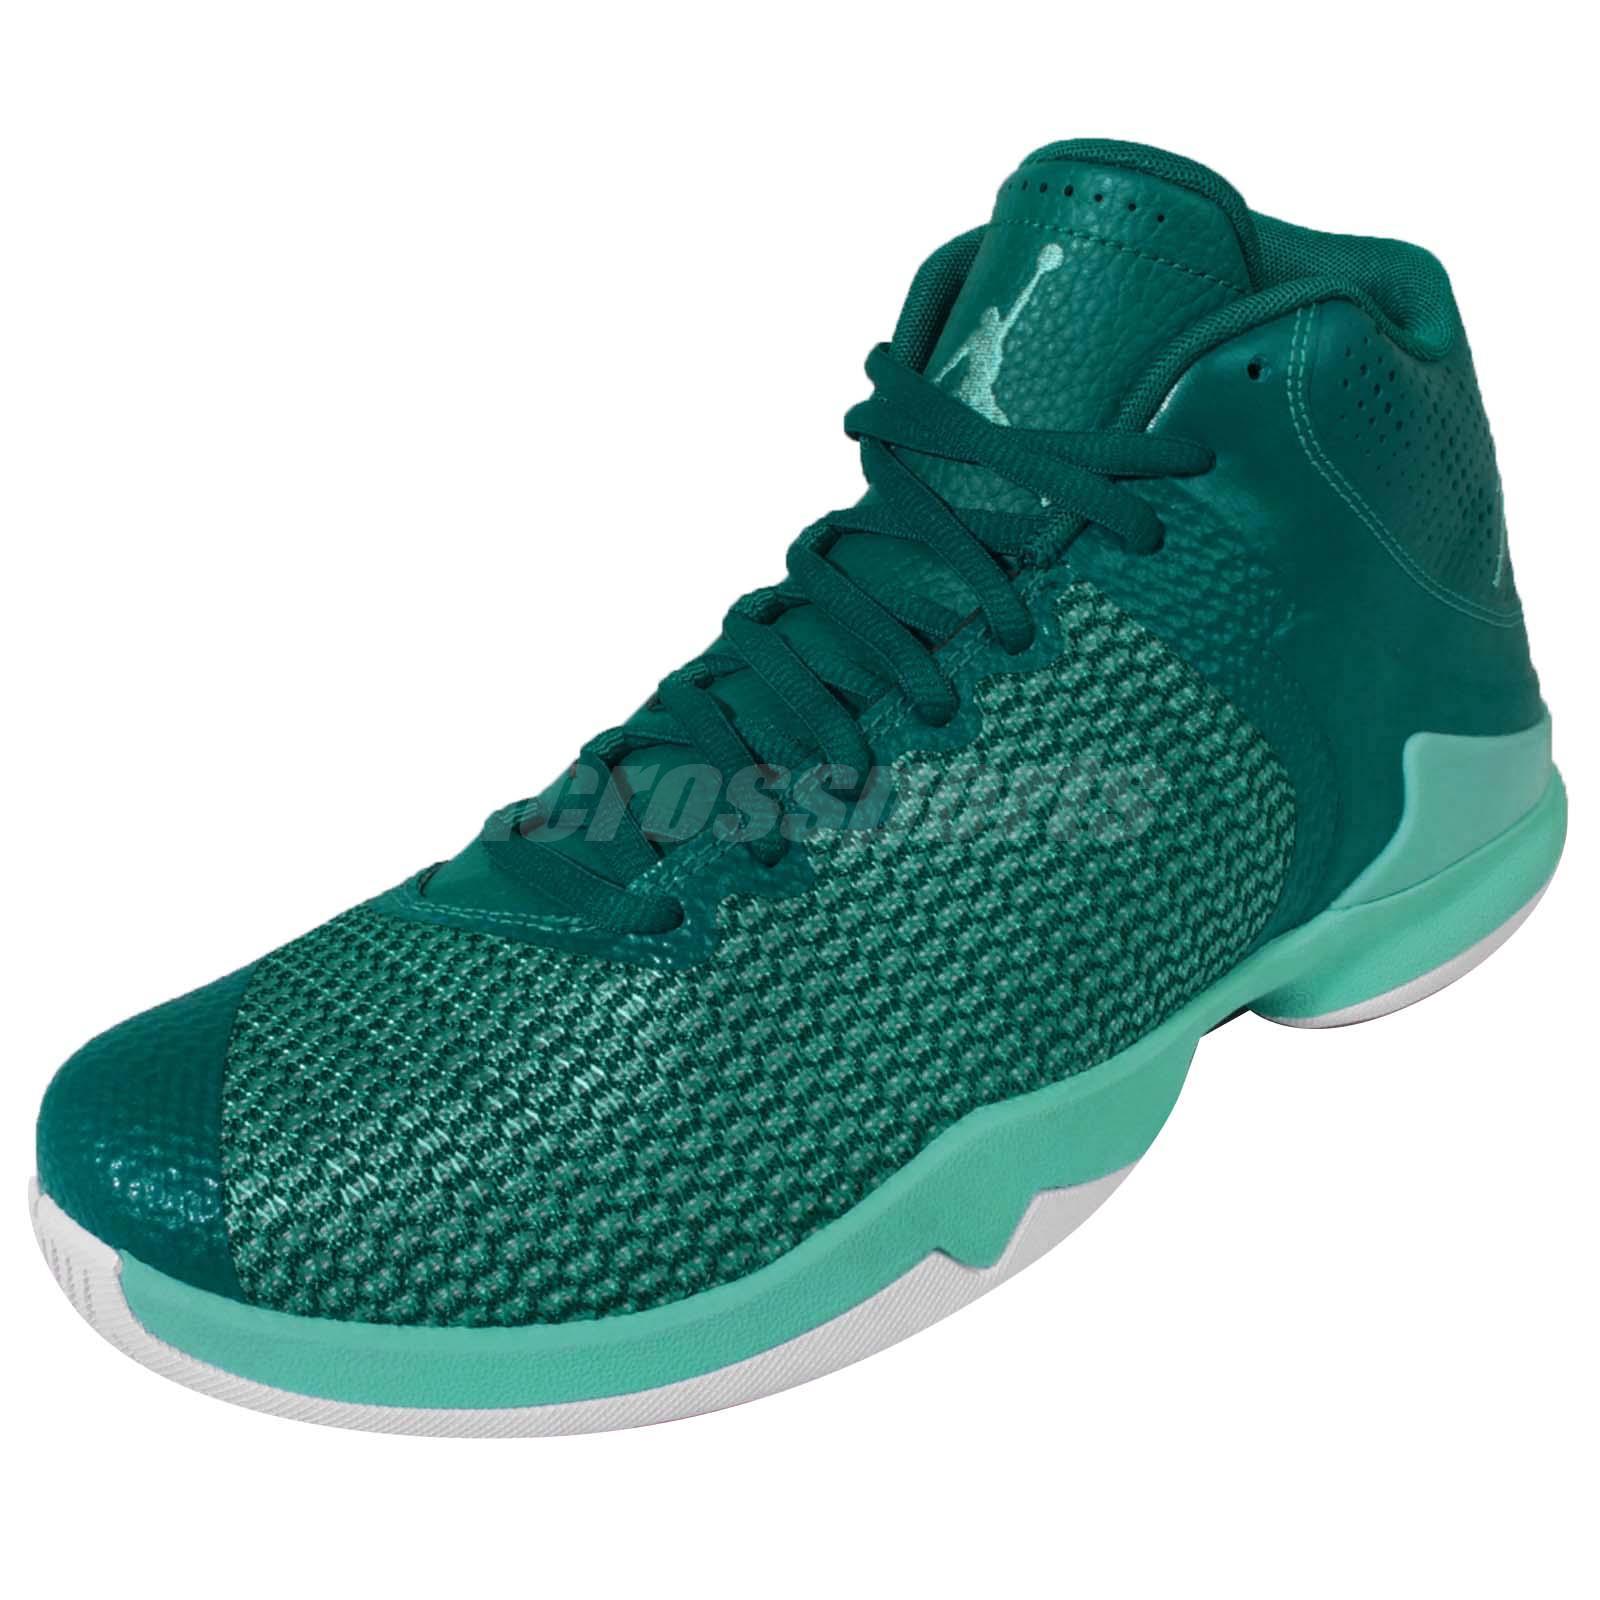 d35aa1a6352d Nike Jordan Super.Fly 4 PO X IV Blake Griffin Green Mens Basketball ...